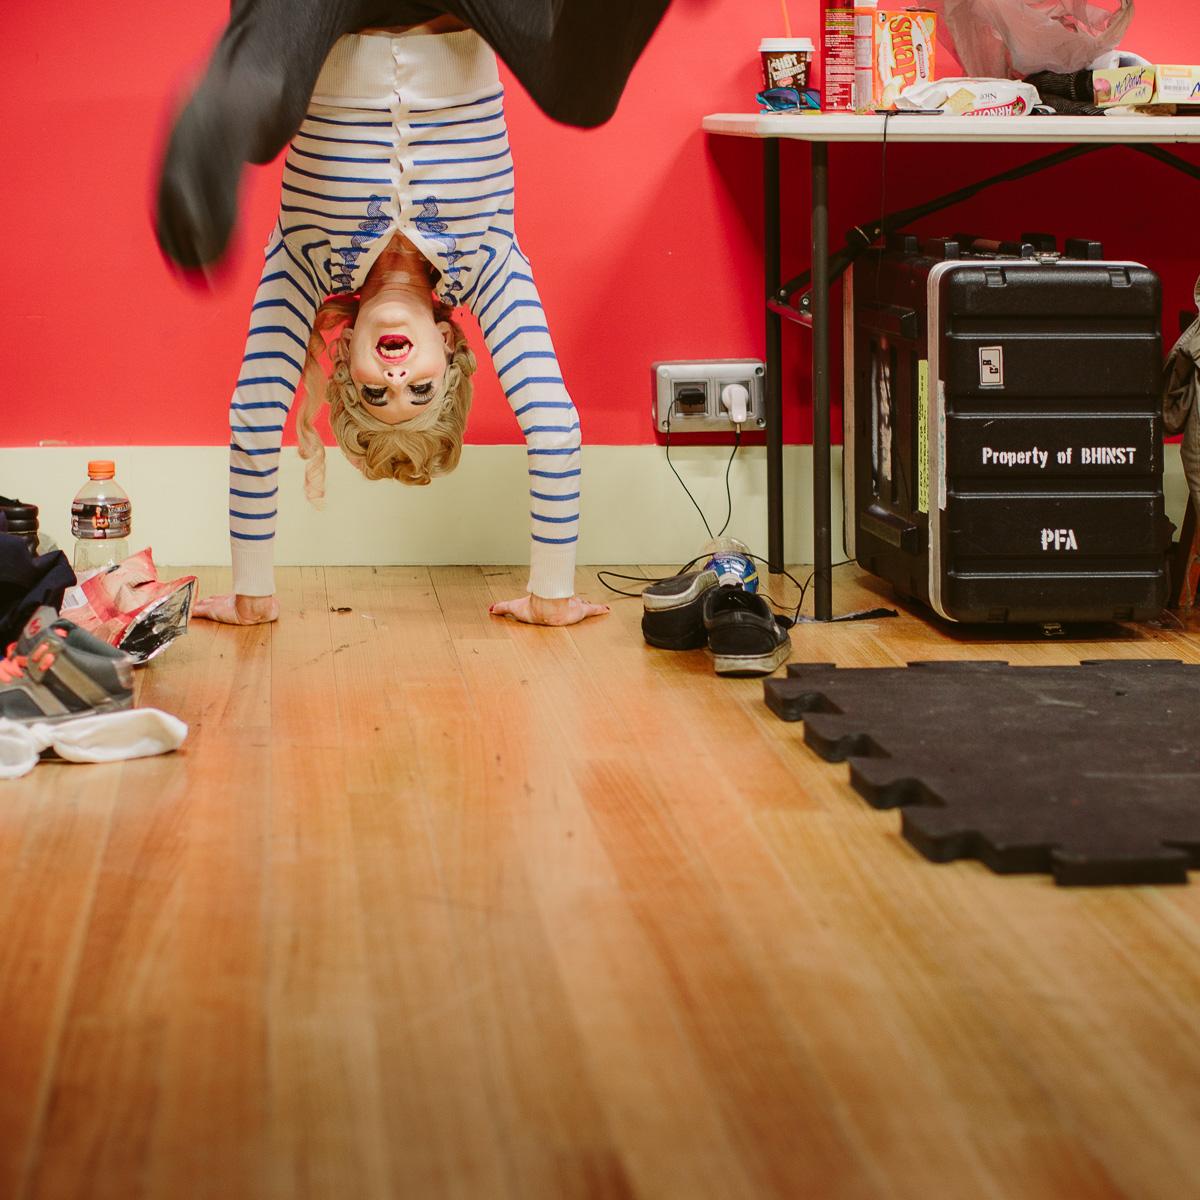 Torte e Mort by Anya Anastasia at the Melba Spiegeltent, Melbourne Fringe, September 2015